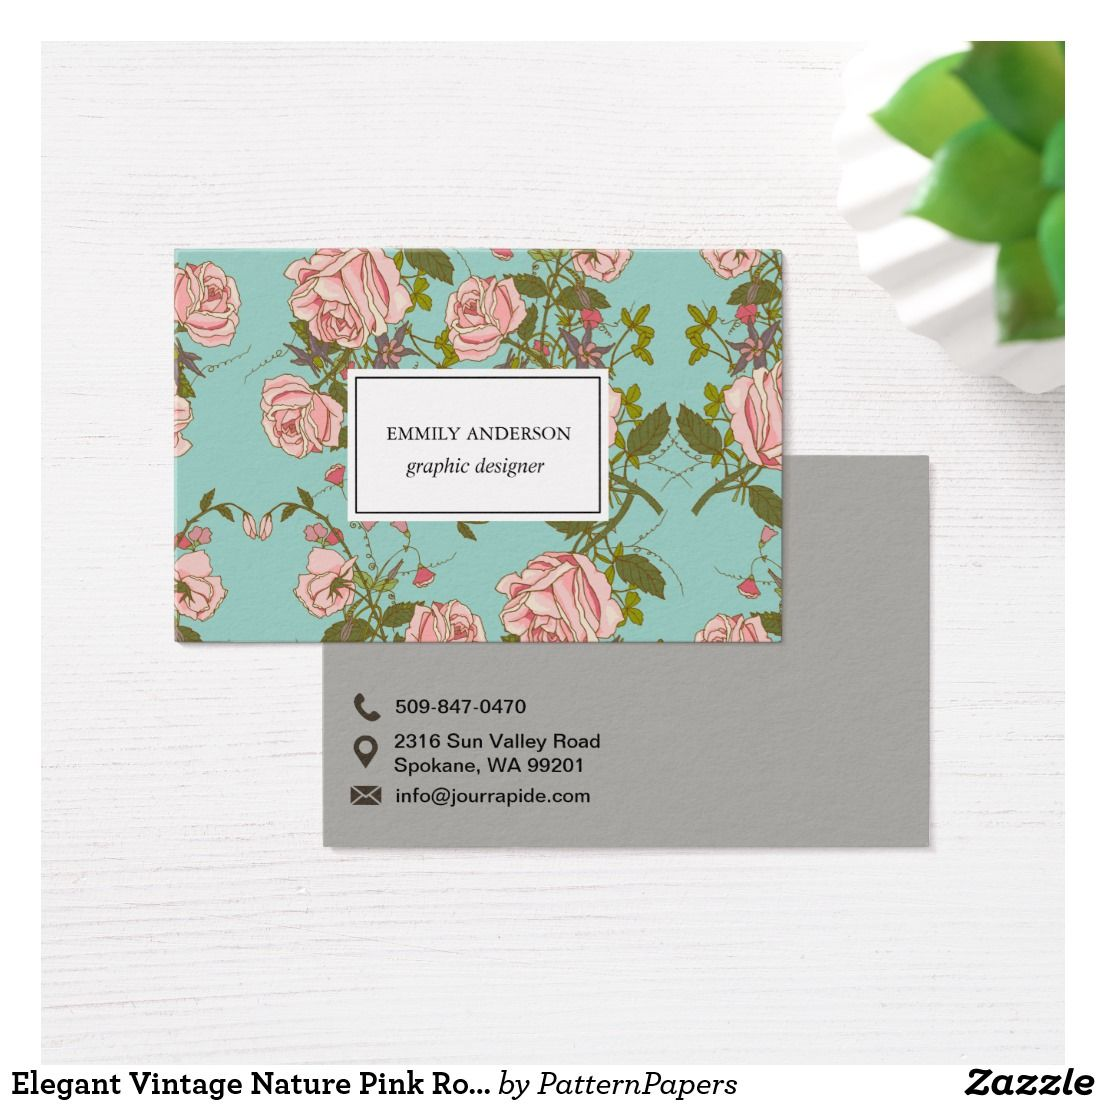 Elegant Vintage Nature Pink Roses Beautiful Flower Business Card ...